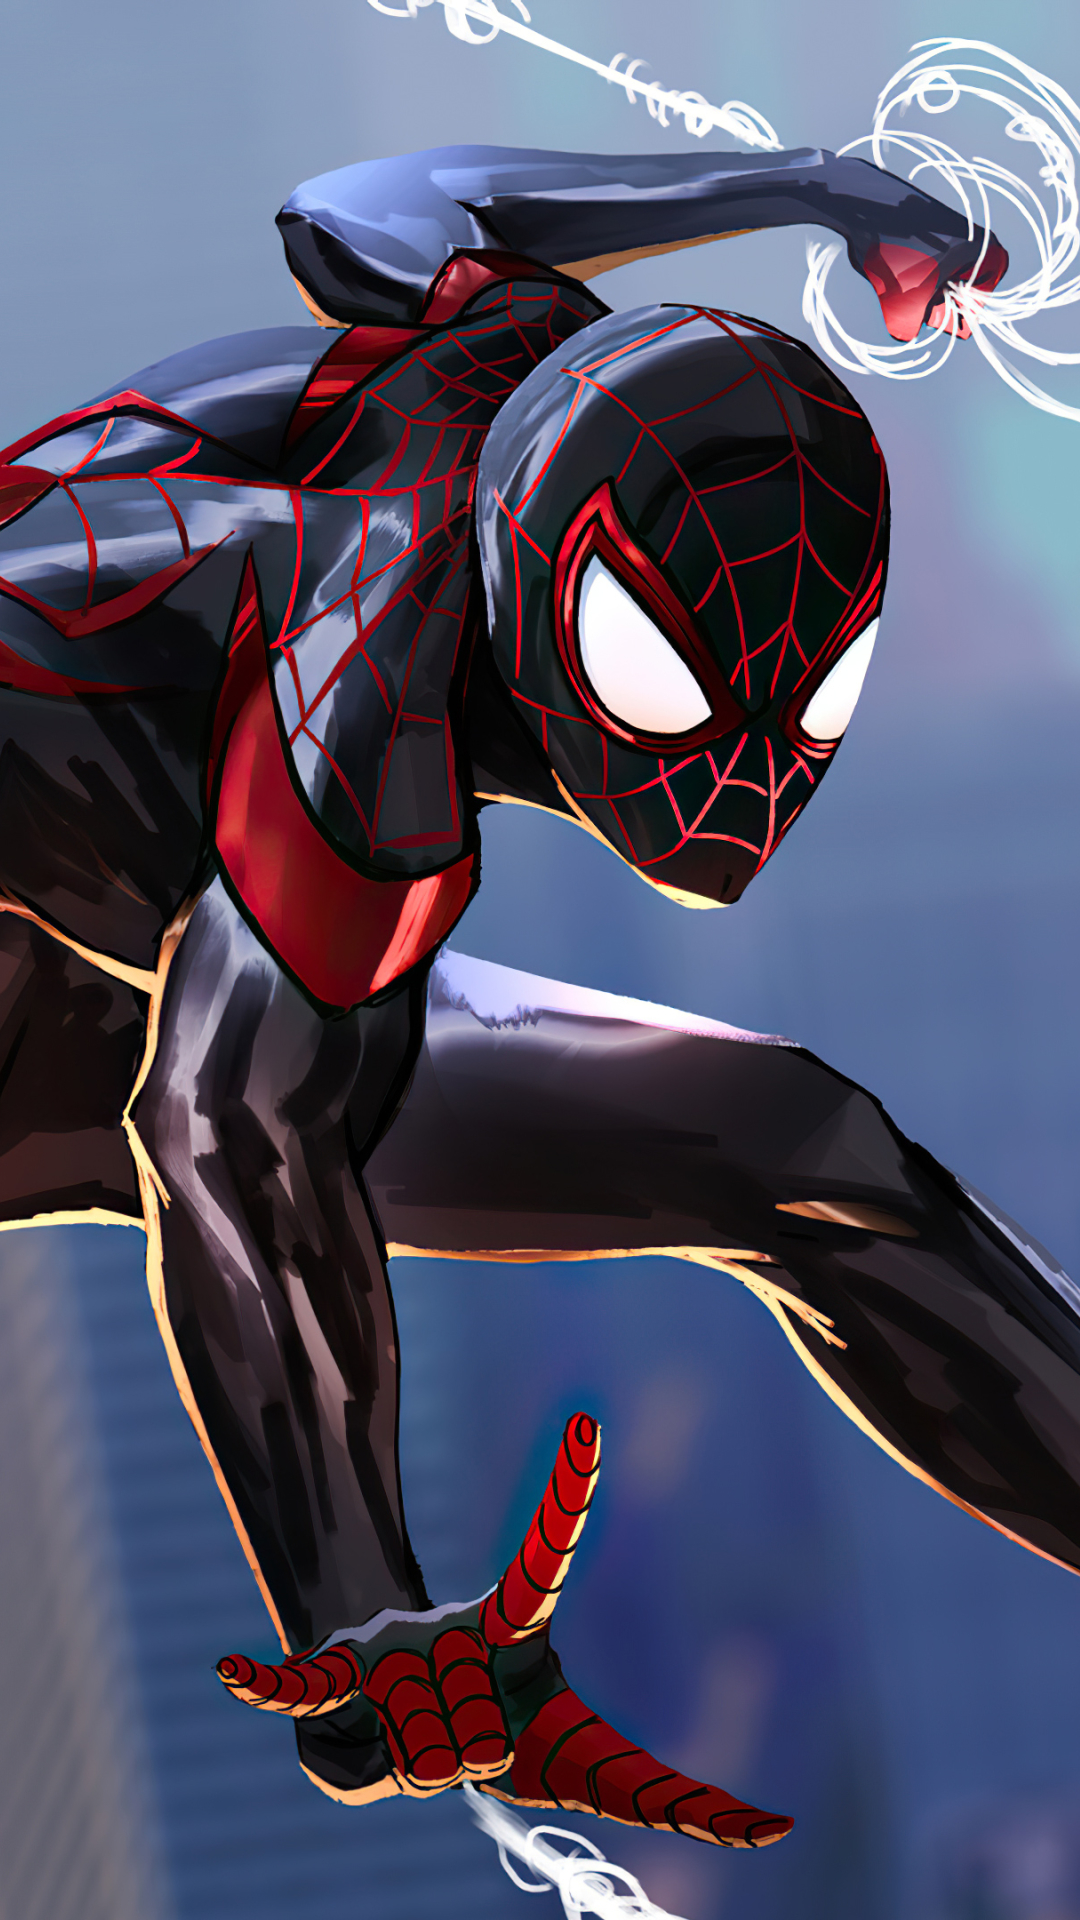 1080x1920 Spider-Man 2 Into The Spider-Verse Art Iphone 7 ...